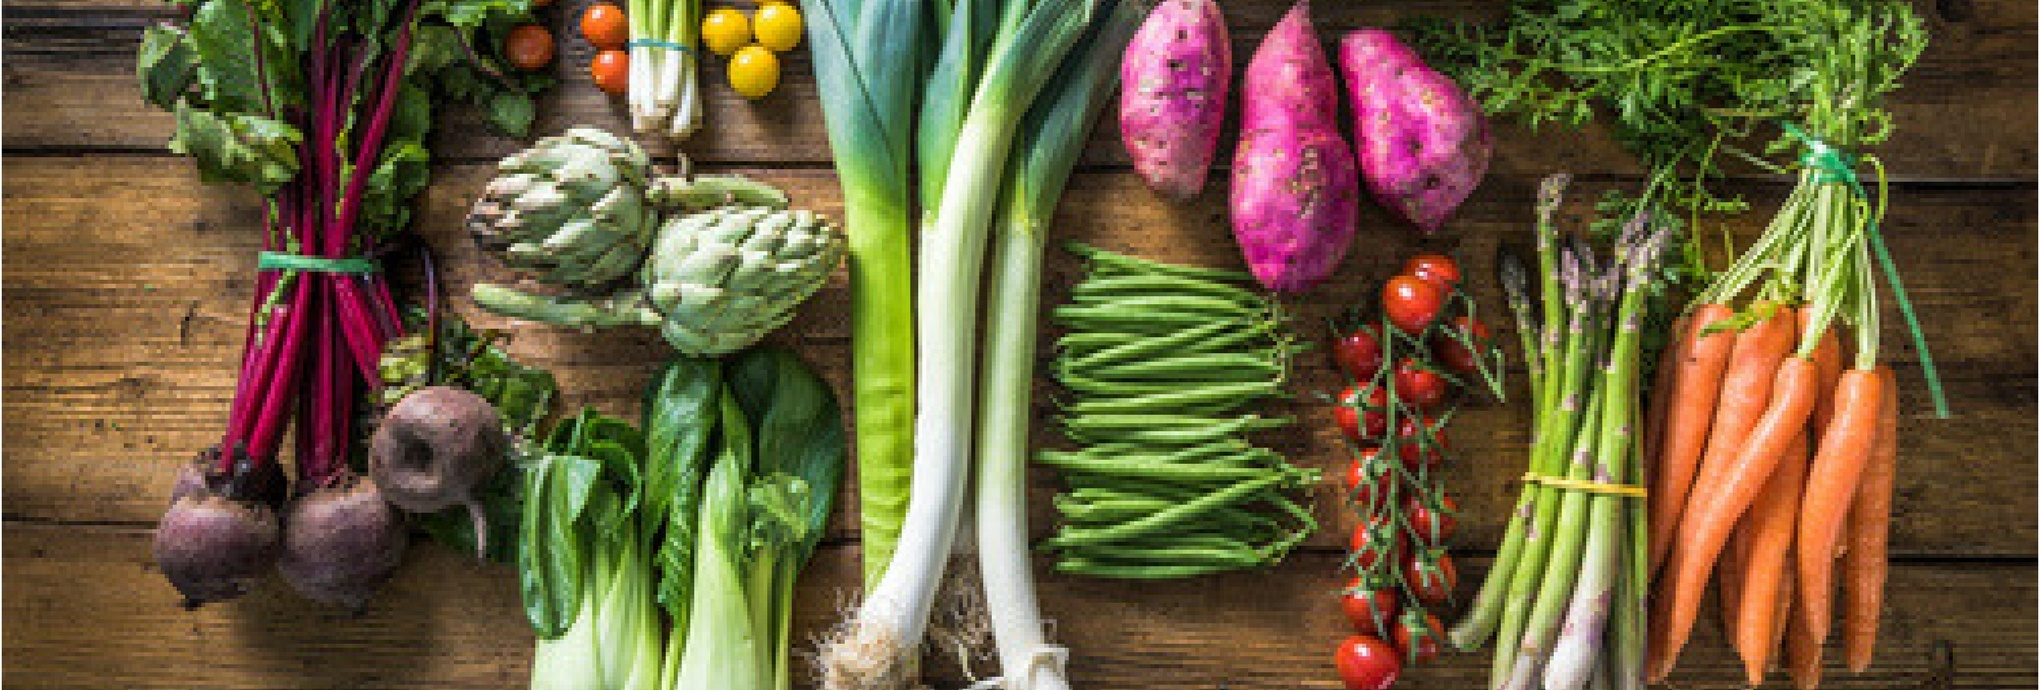 amazon whole foods acquisition.jpg